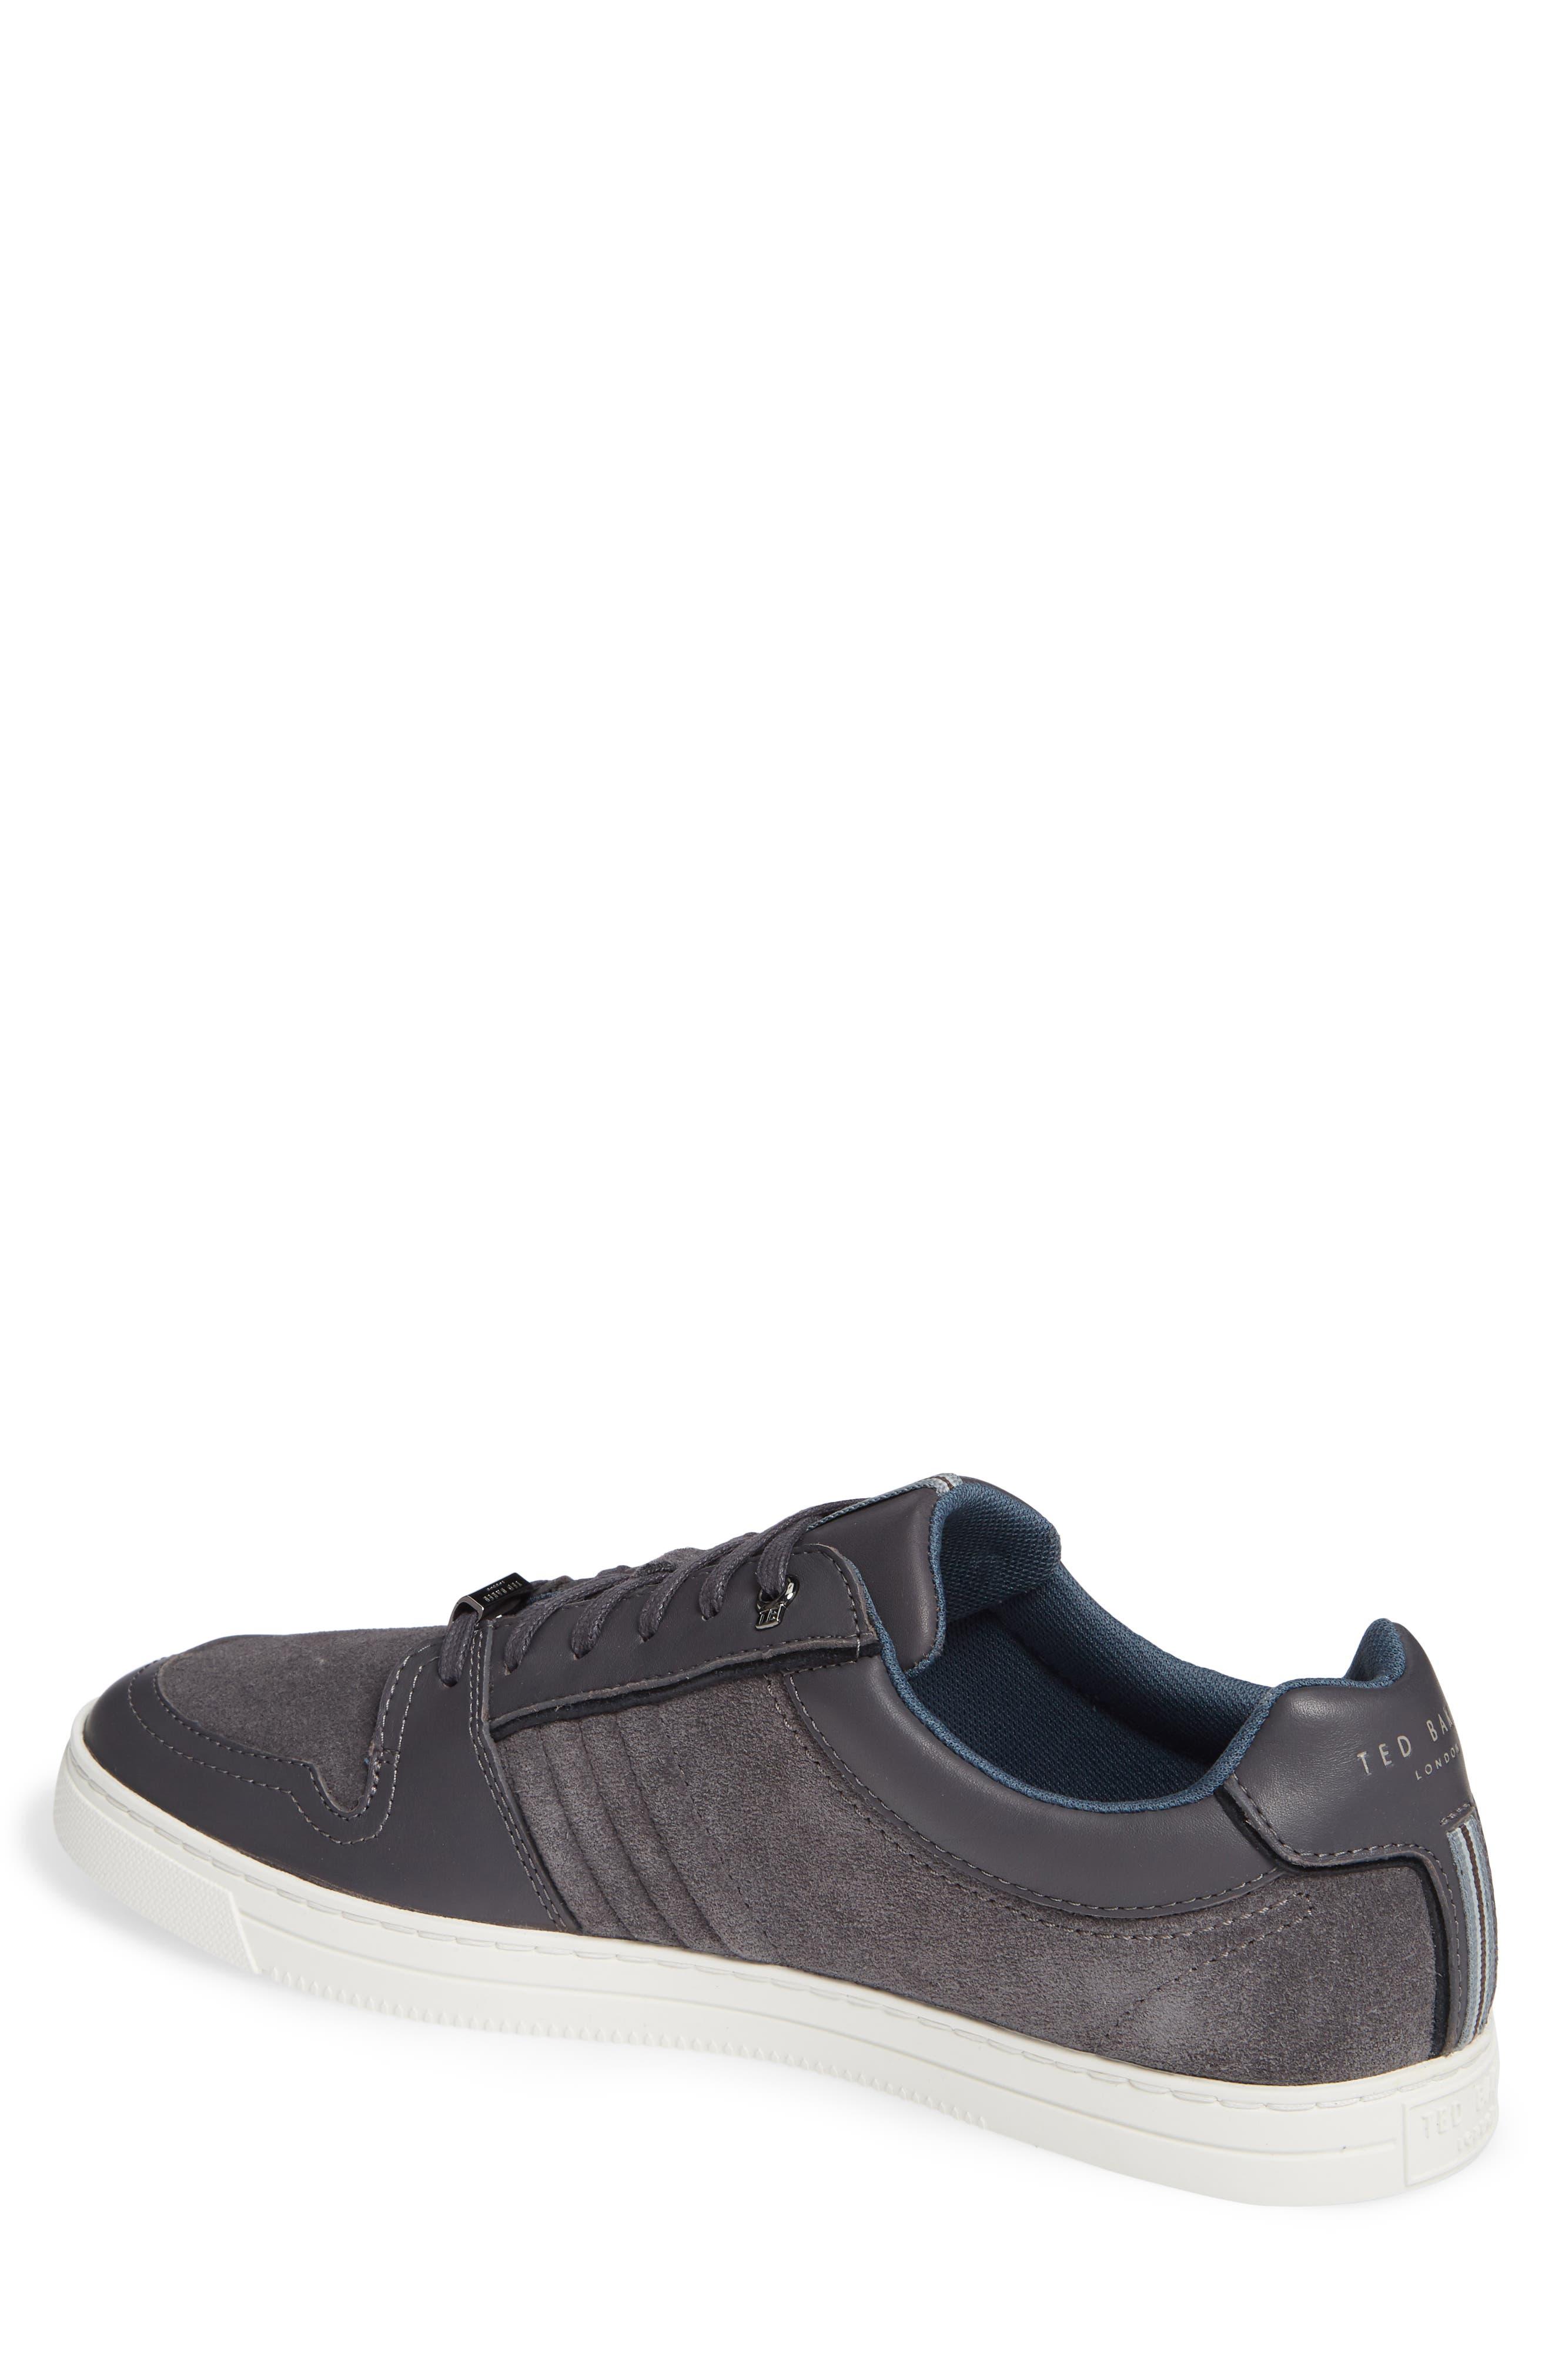 Kalhan Sneaker,                             Alternate thumbnail 2, color,                             DARK GREY